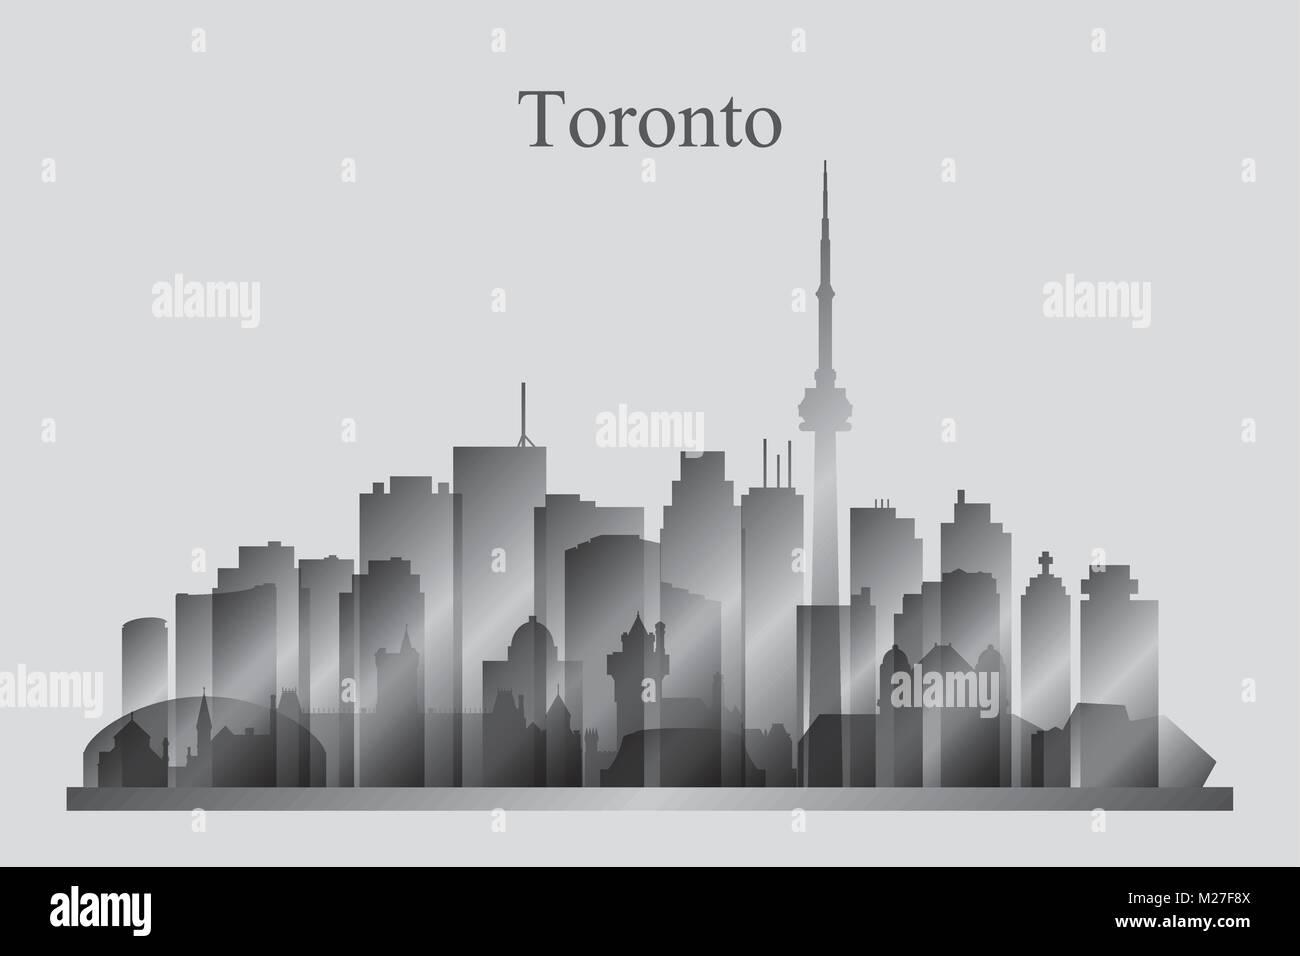 Toronto city skyline silhouette in grayscale, vector illustration - Stock Vector